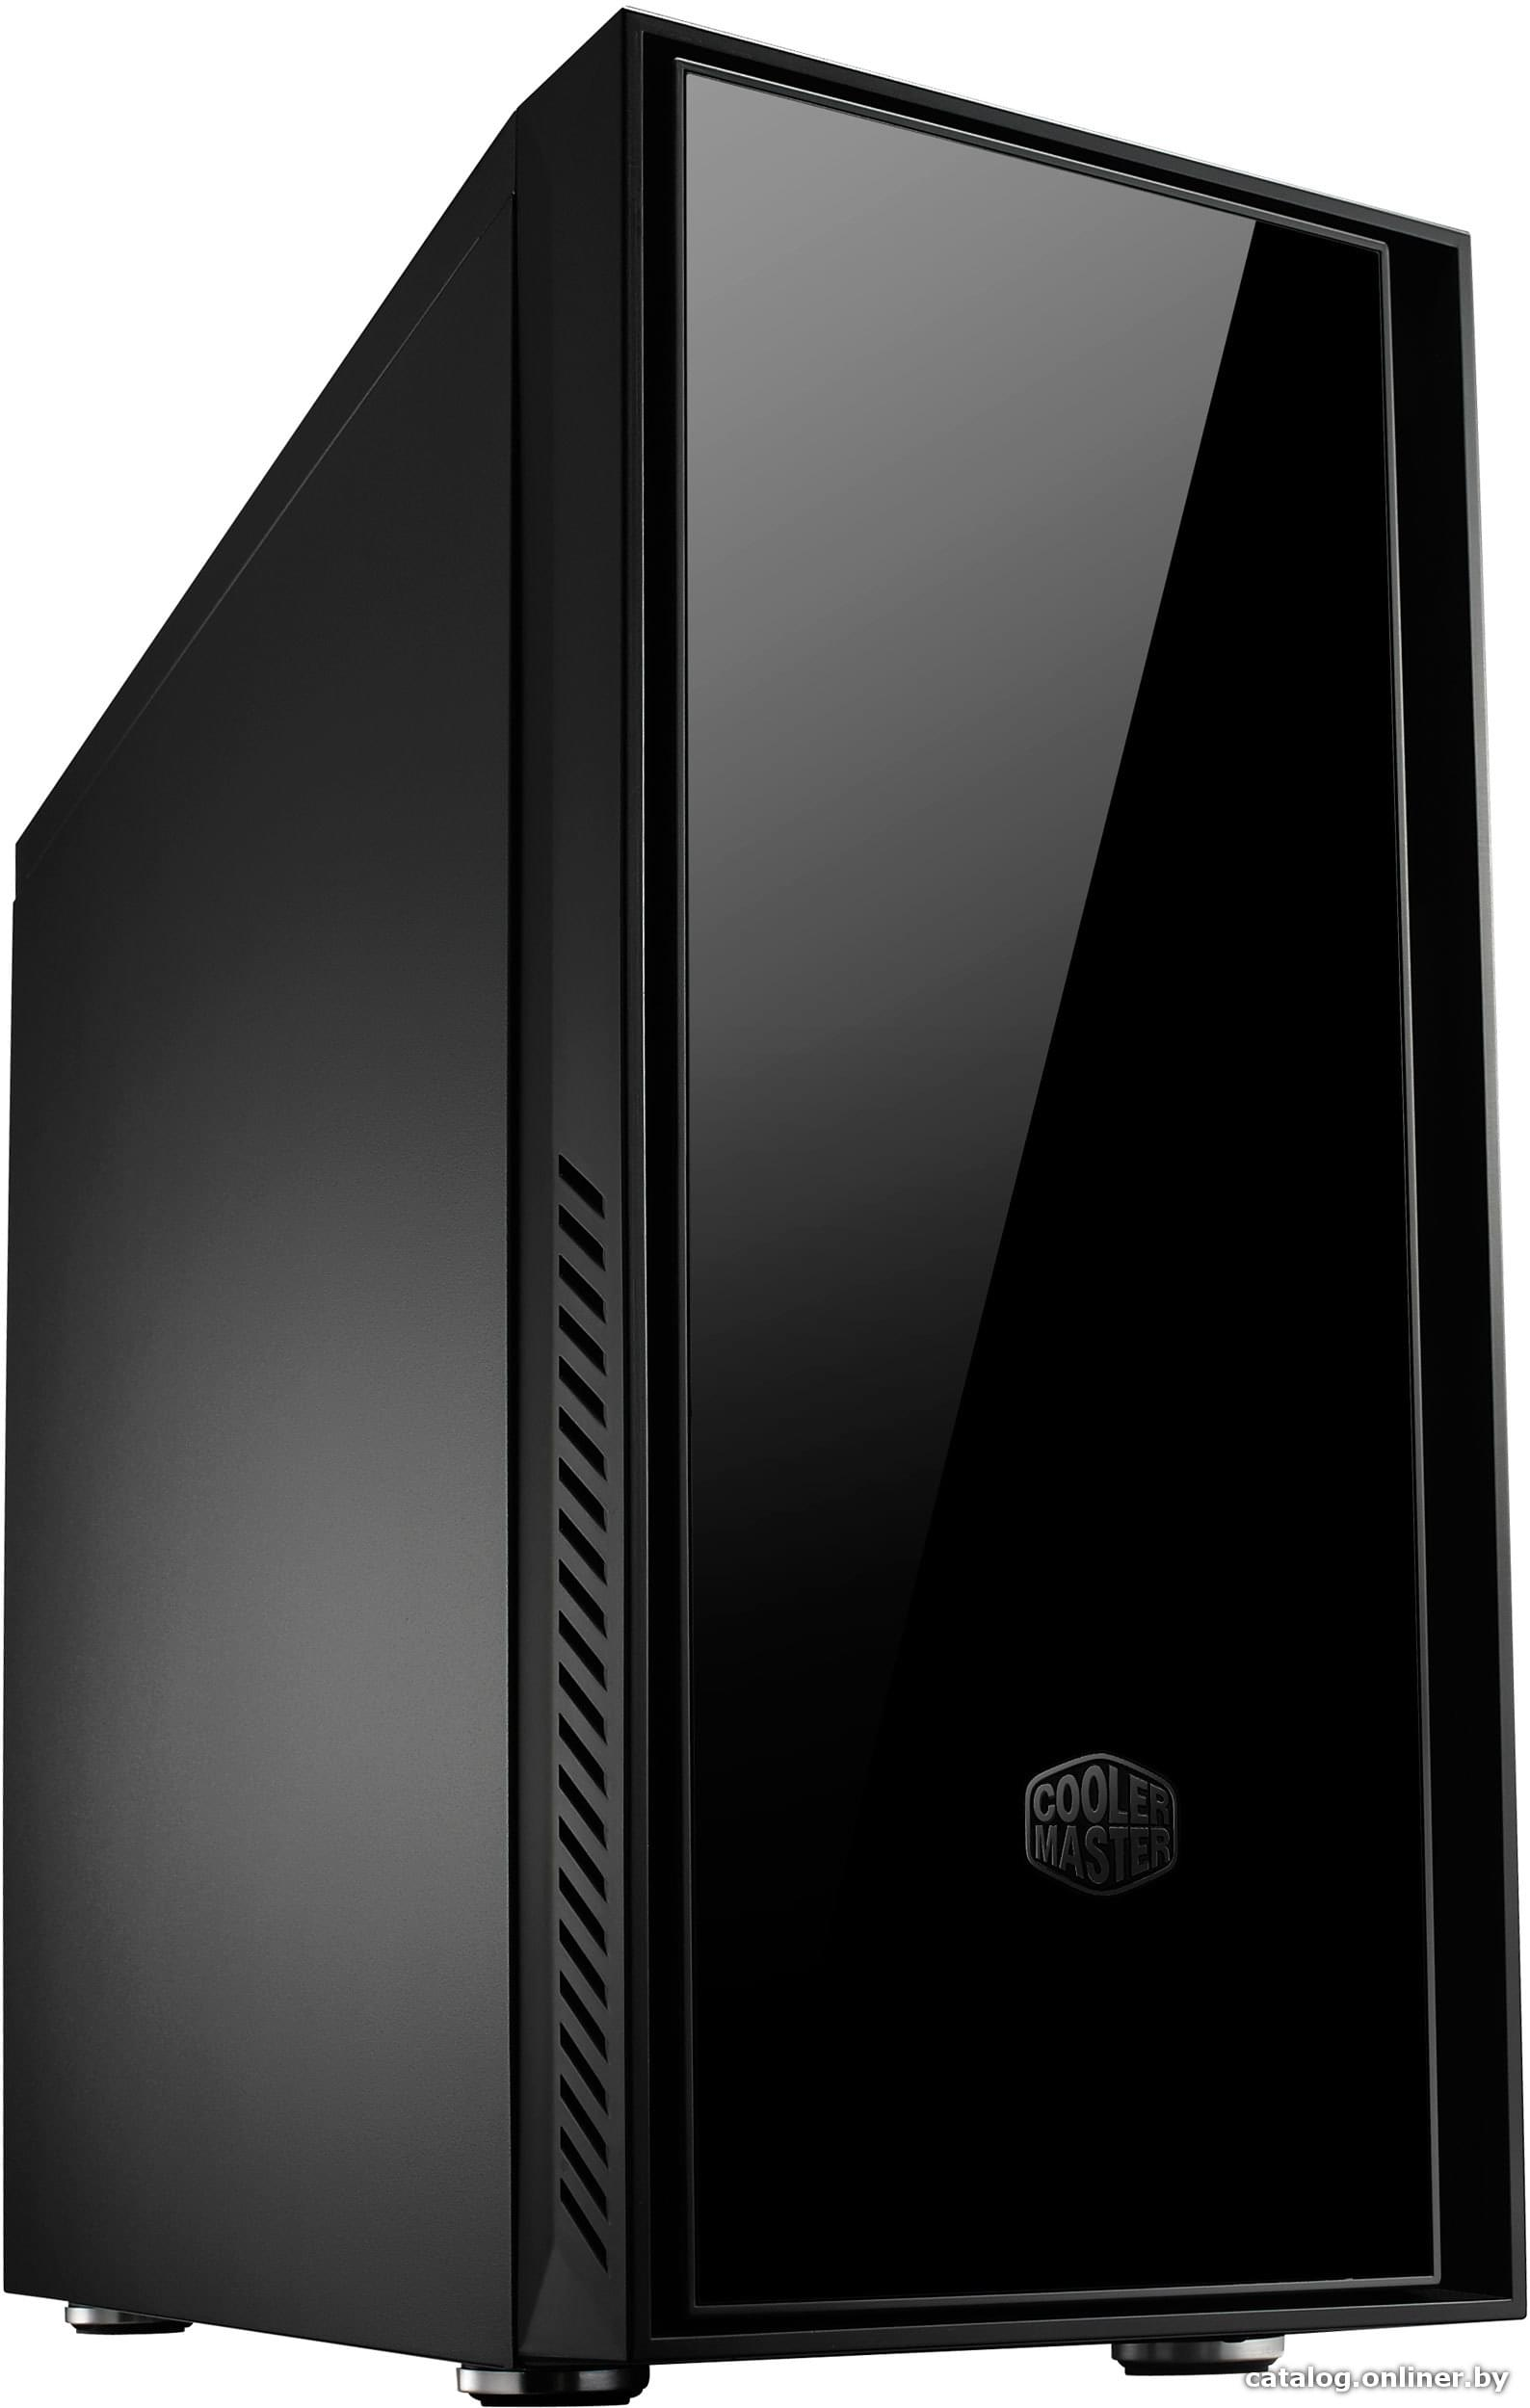 Cooler Master Silencio 550 RC-550-KKA650 (RC-550-KKA650) - Achat / Vente Boîtier PC sur Cybertek.fr - 0